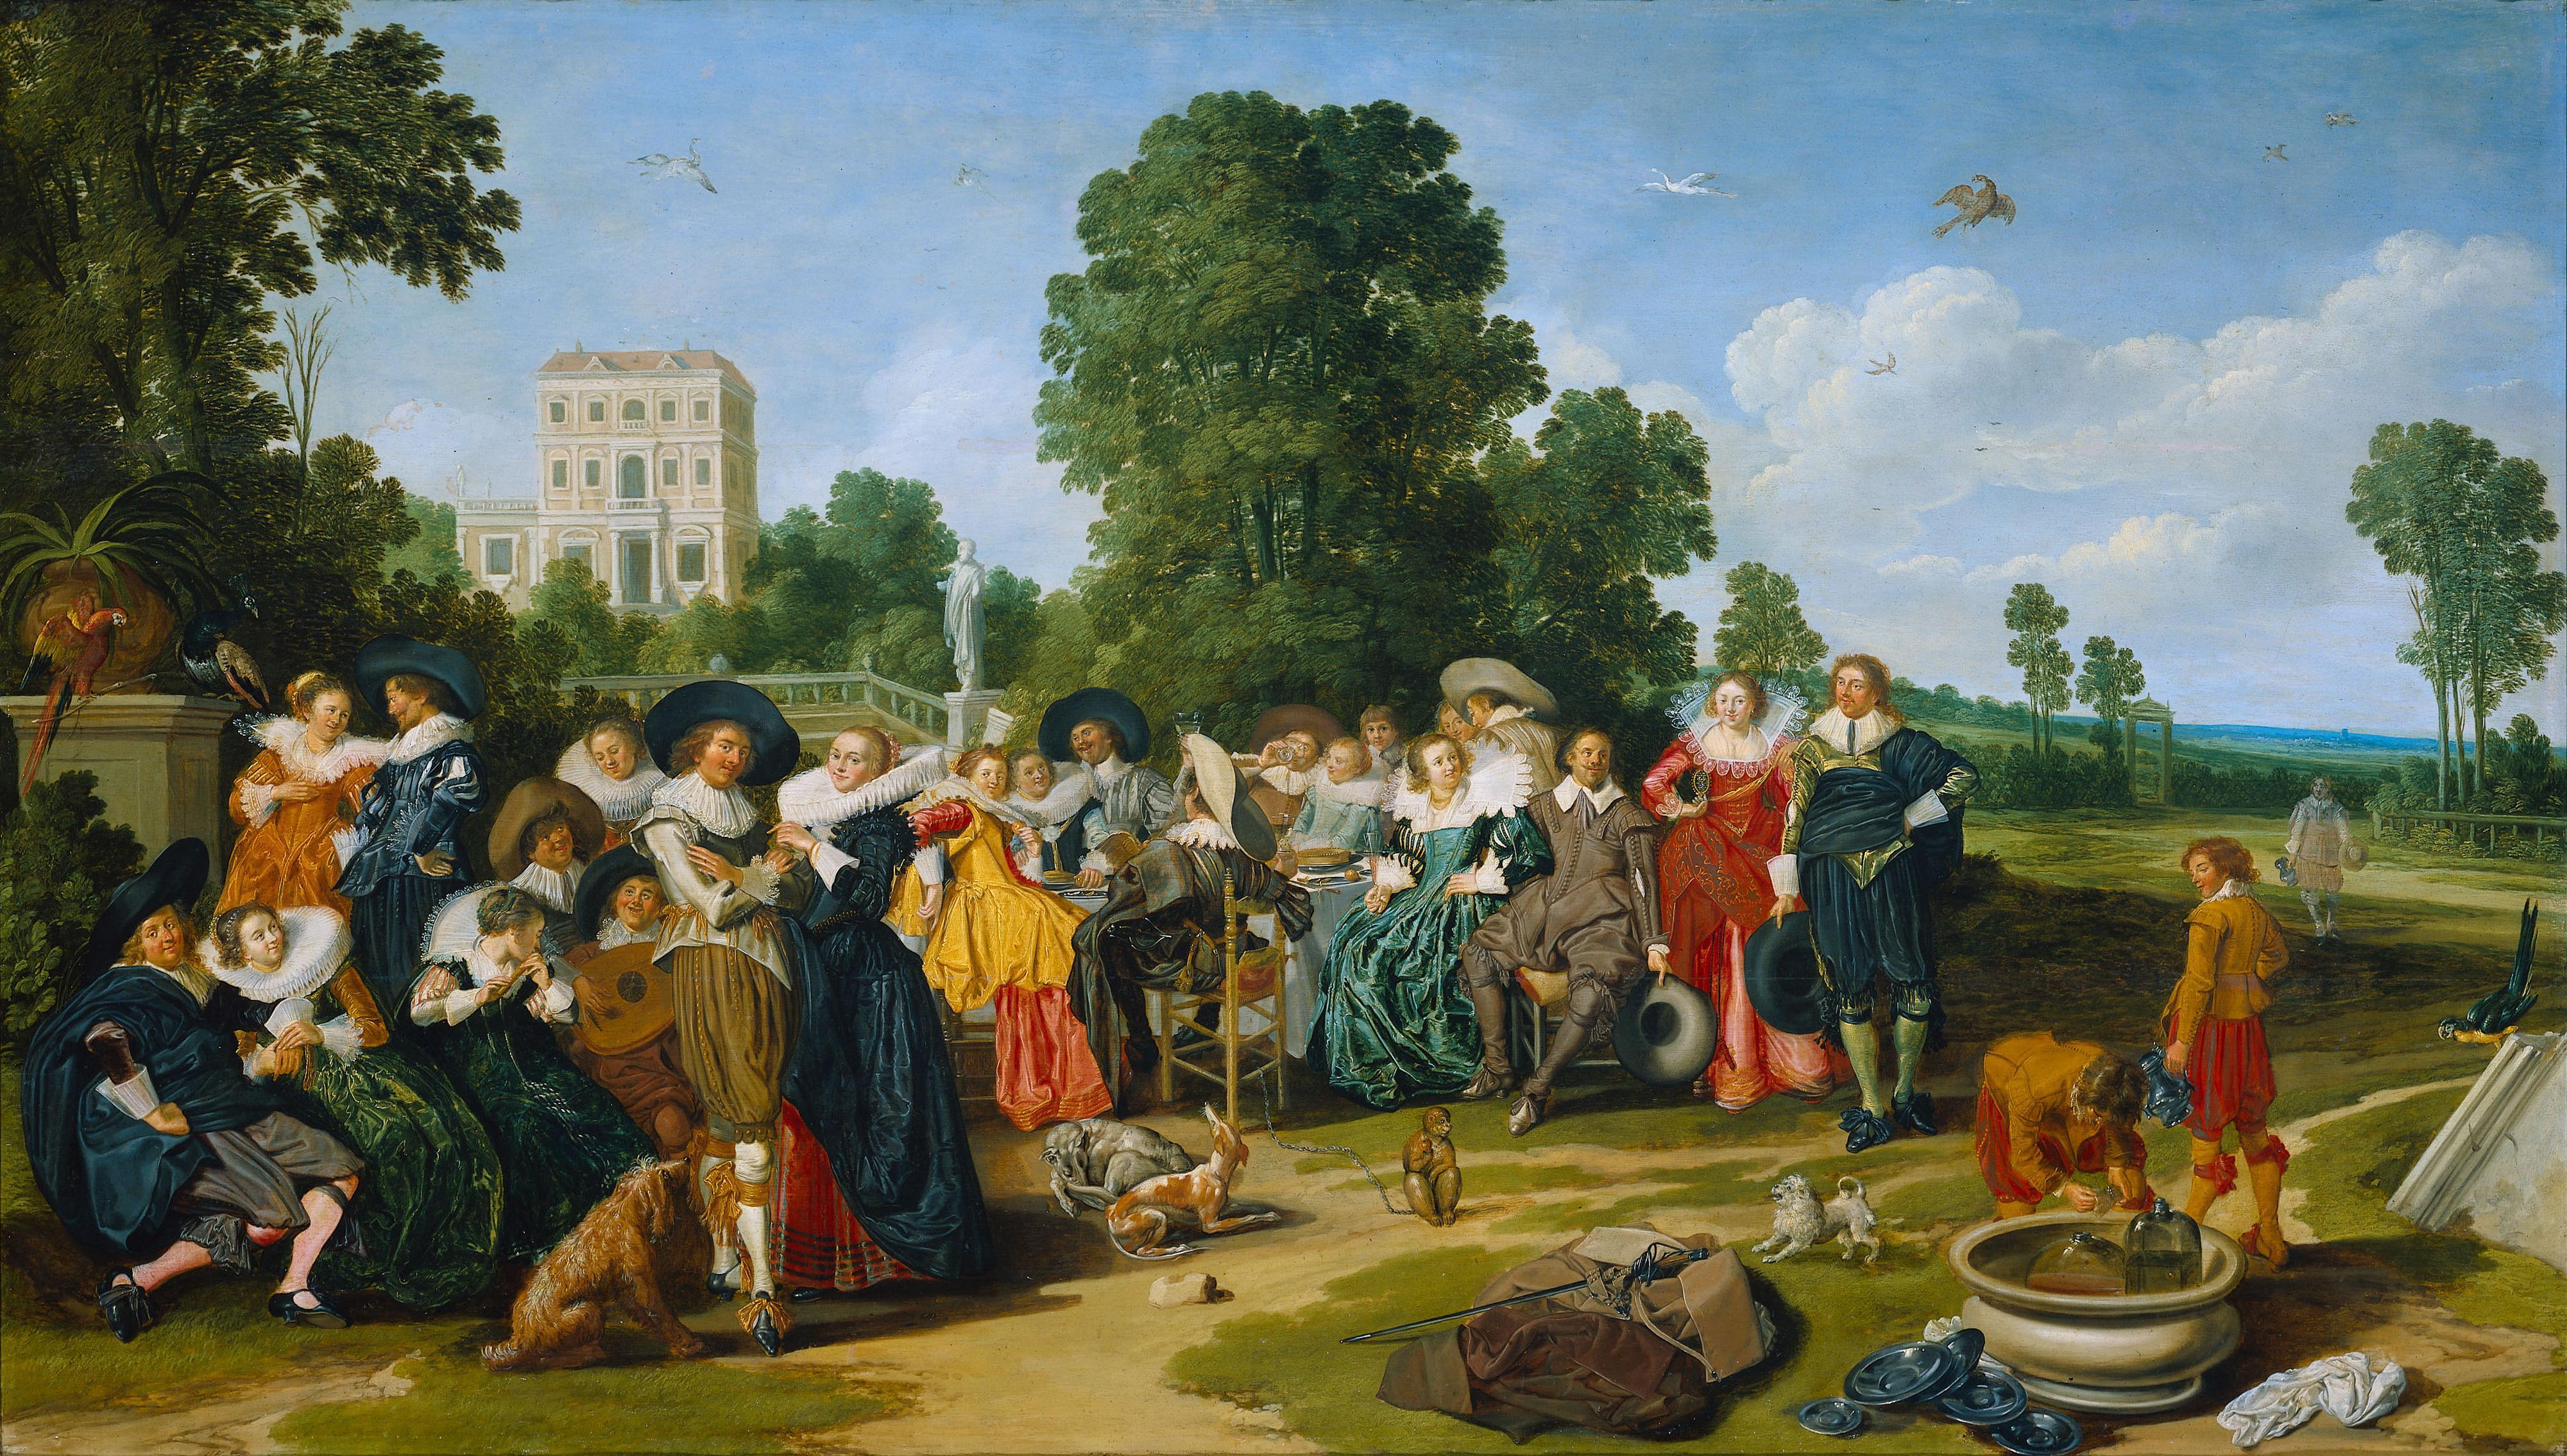 File:Fete Champetre (1627) Dirck Hals.jpg